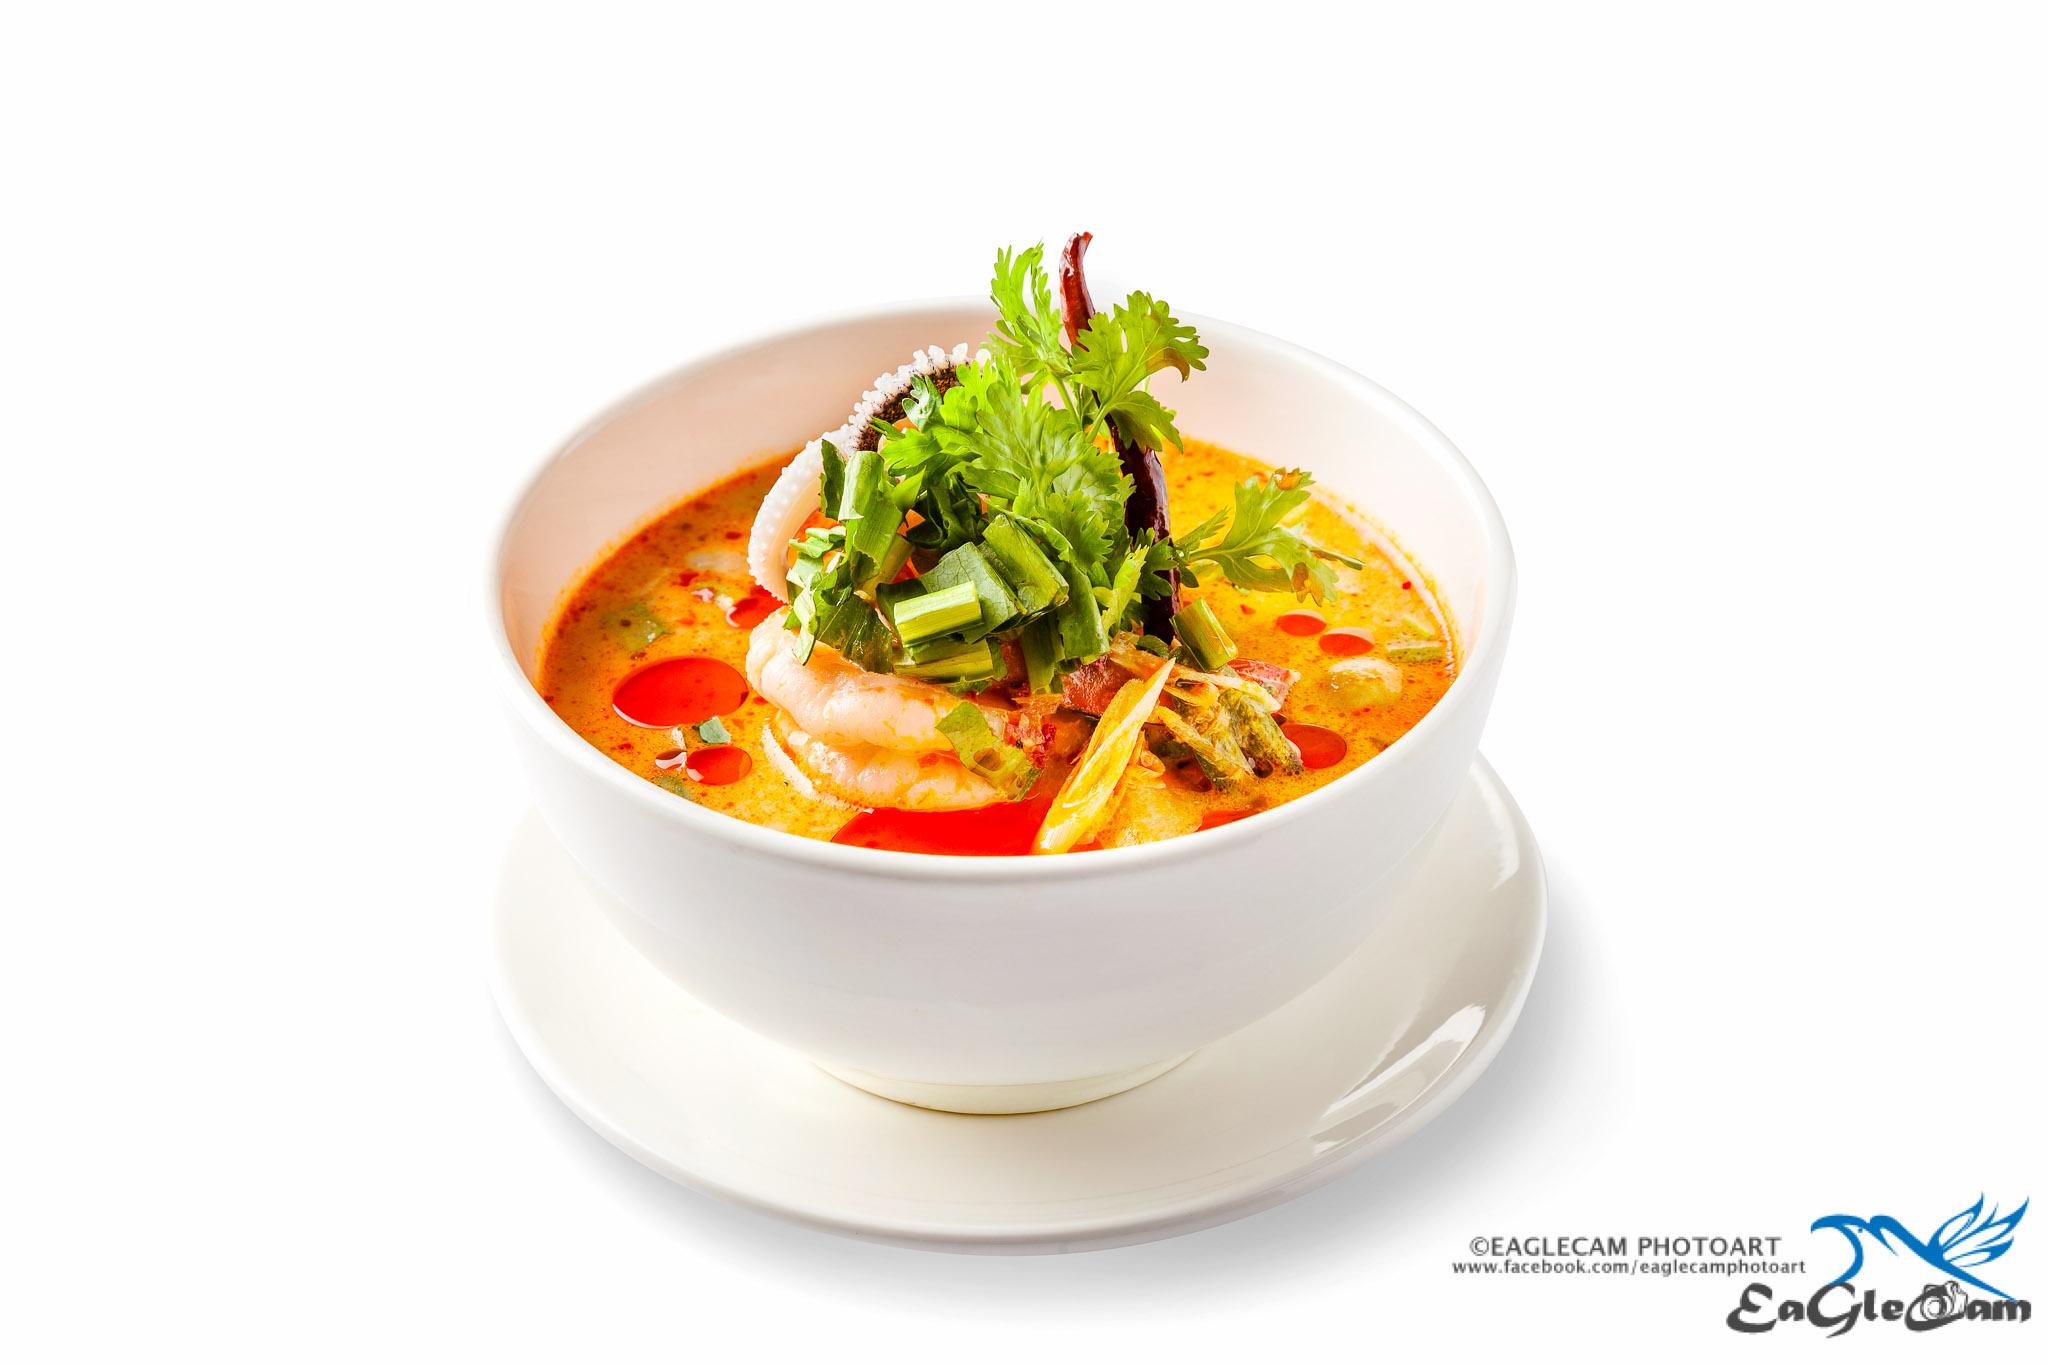 Food Photography #92